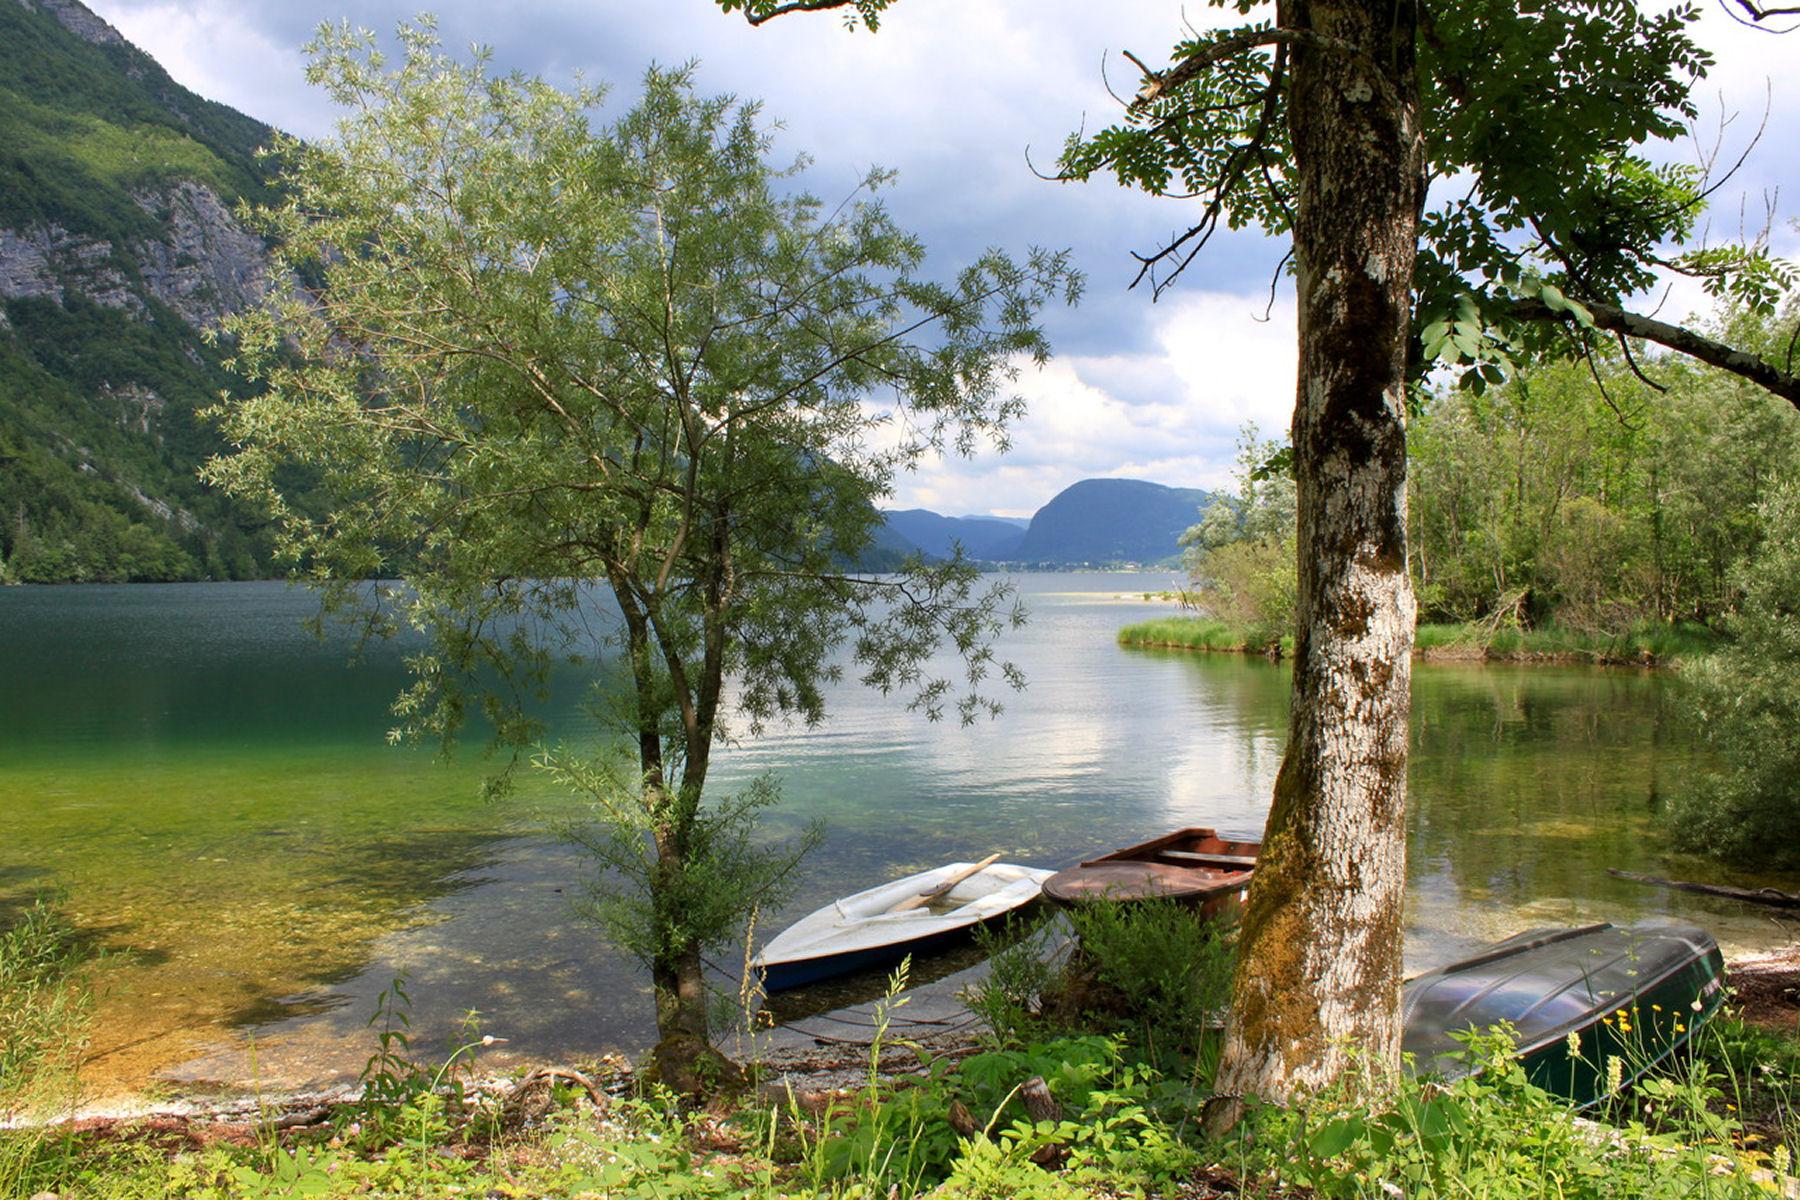 Some boats at Lake Bohinj in Slovenia